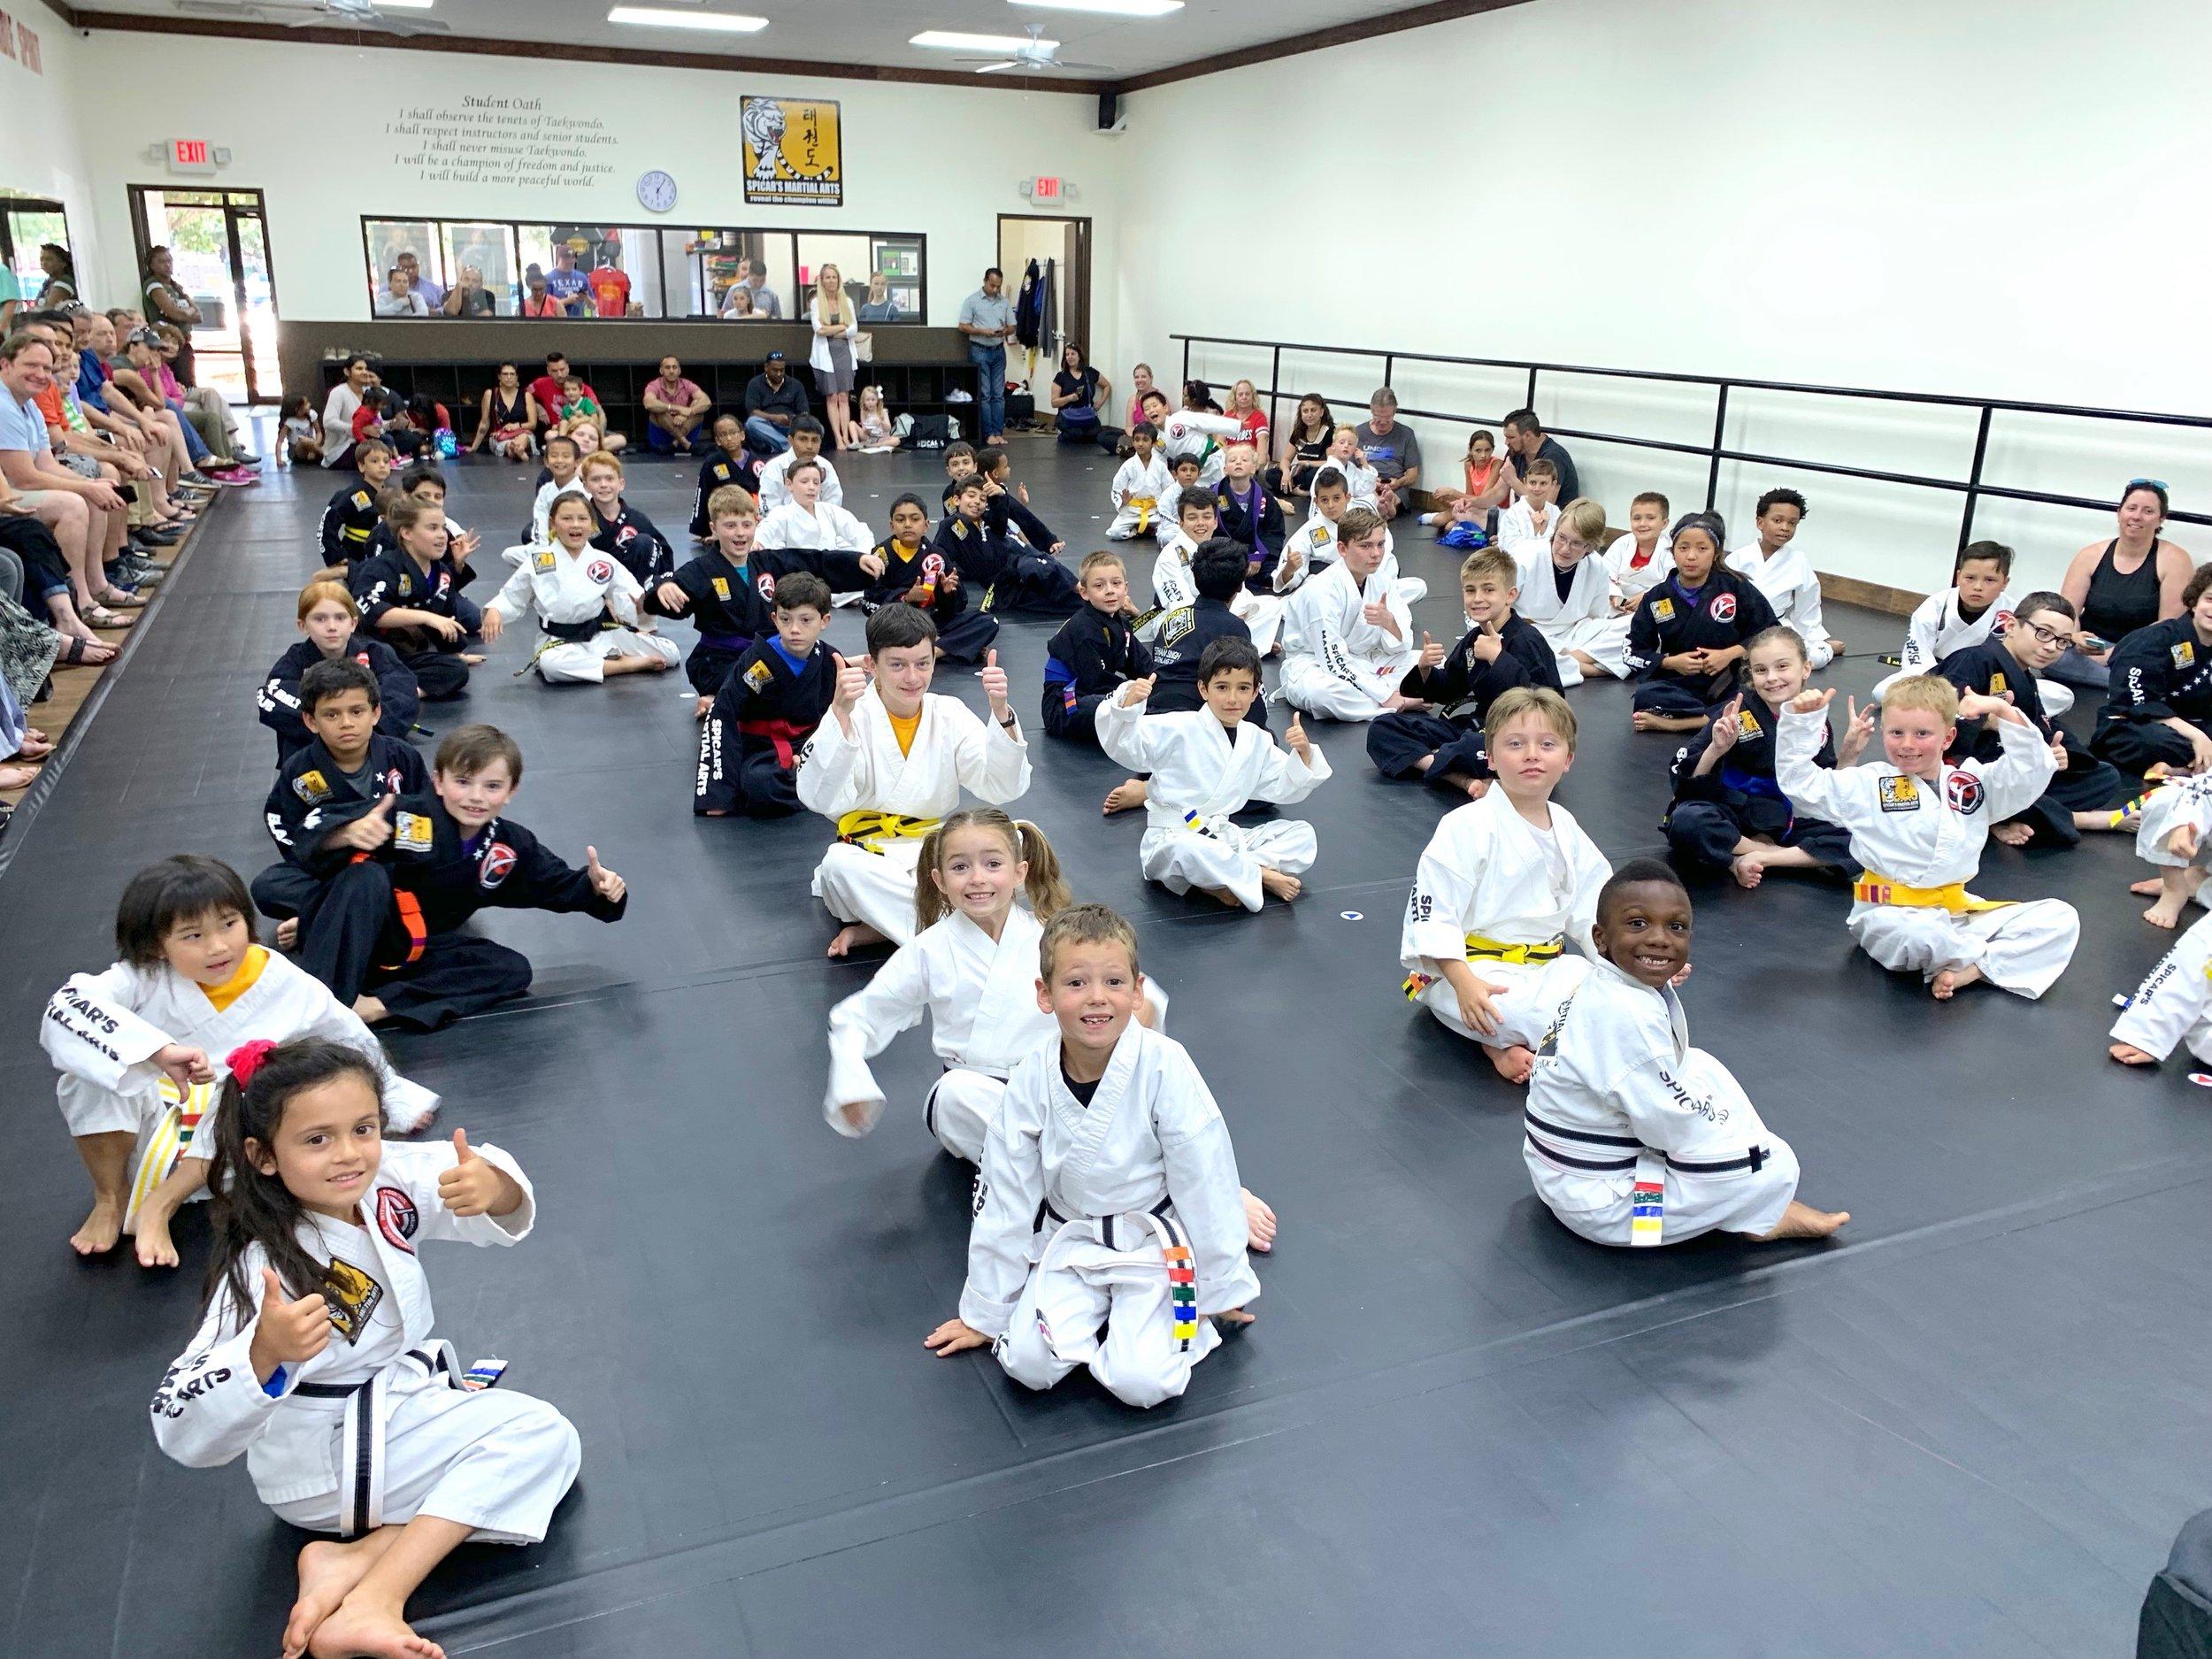 karate-kids-program-souhtlake-keller-grapevine-texas00061.jpeg